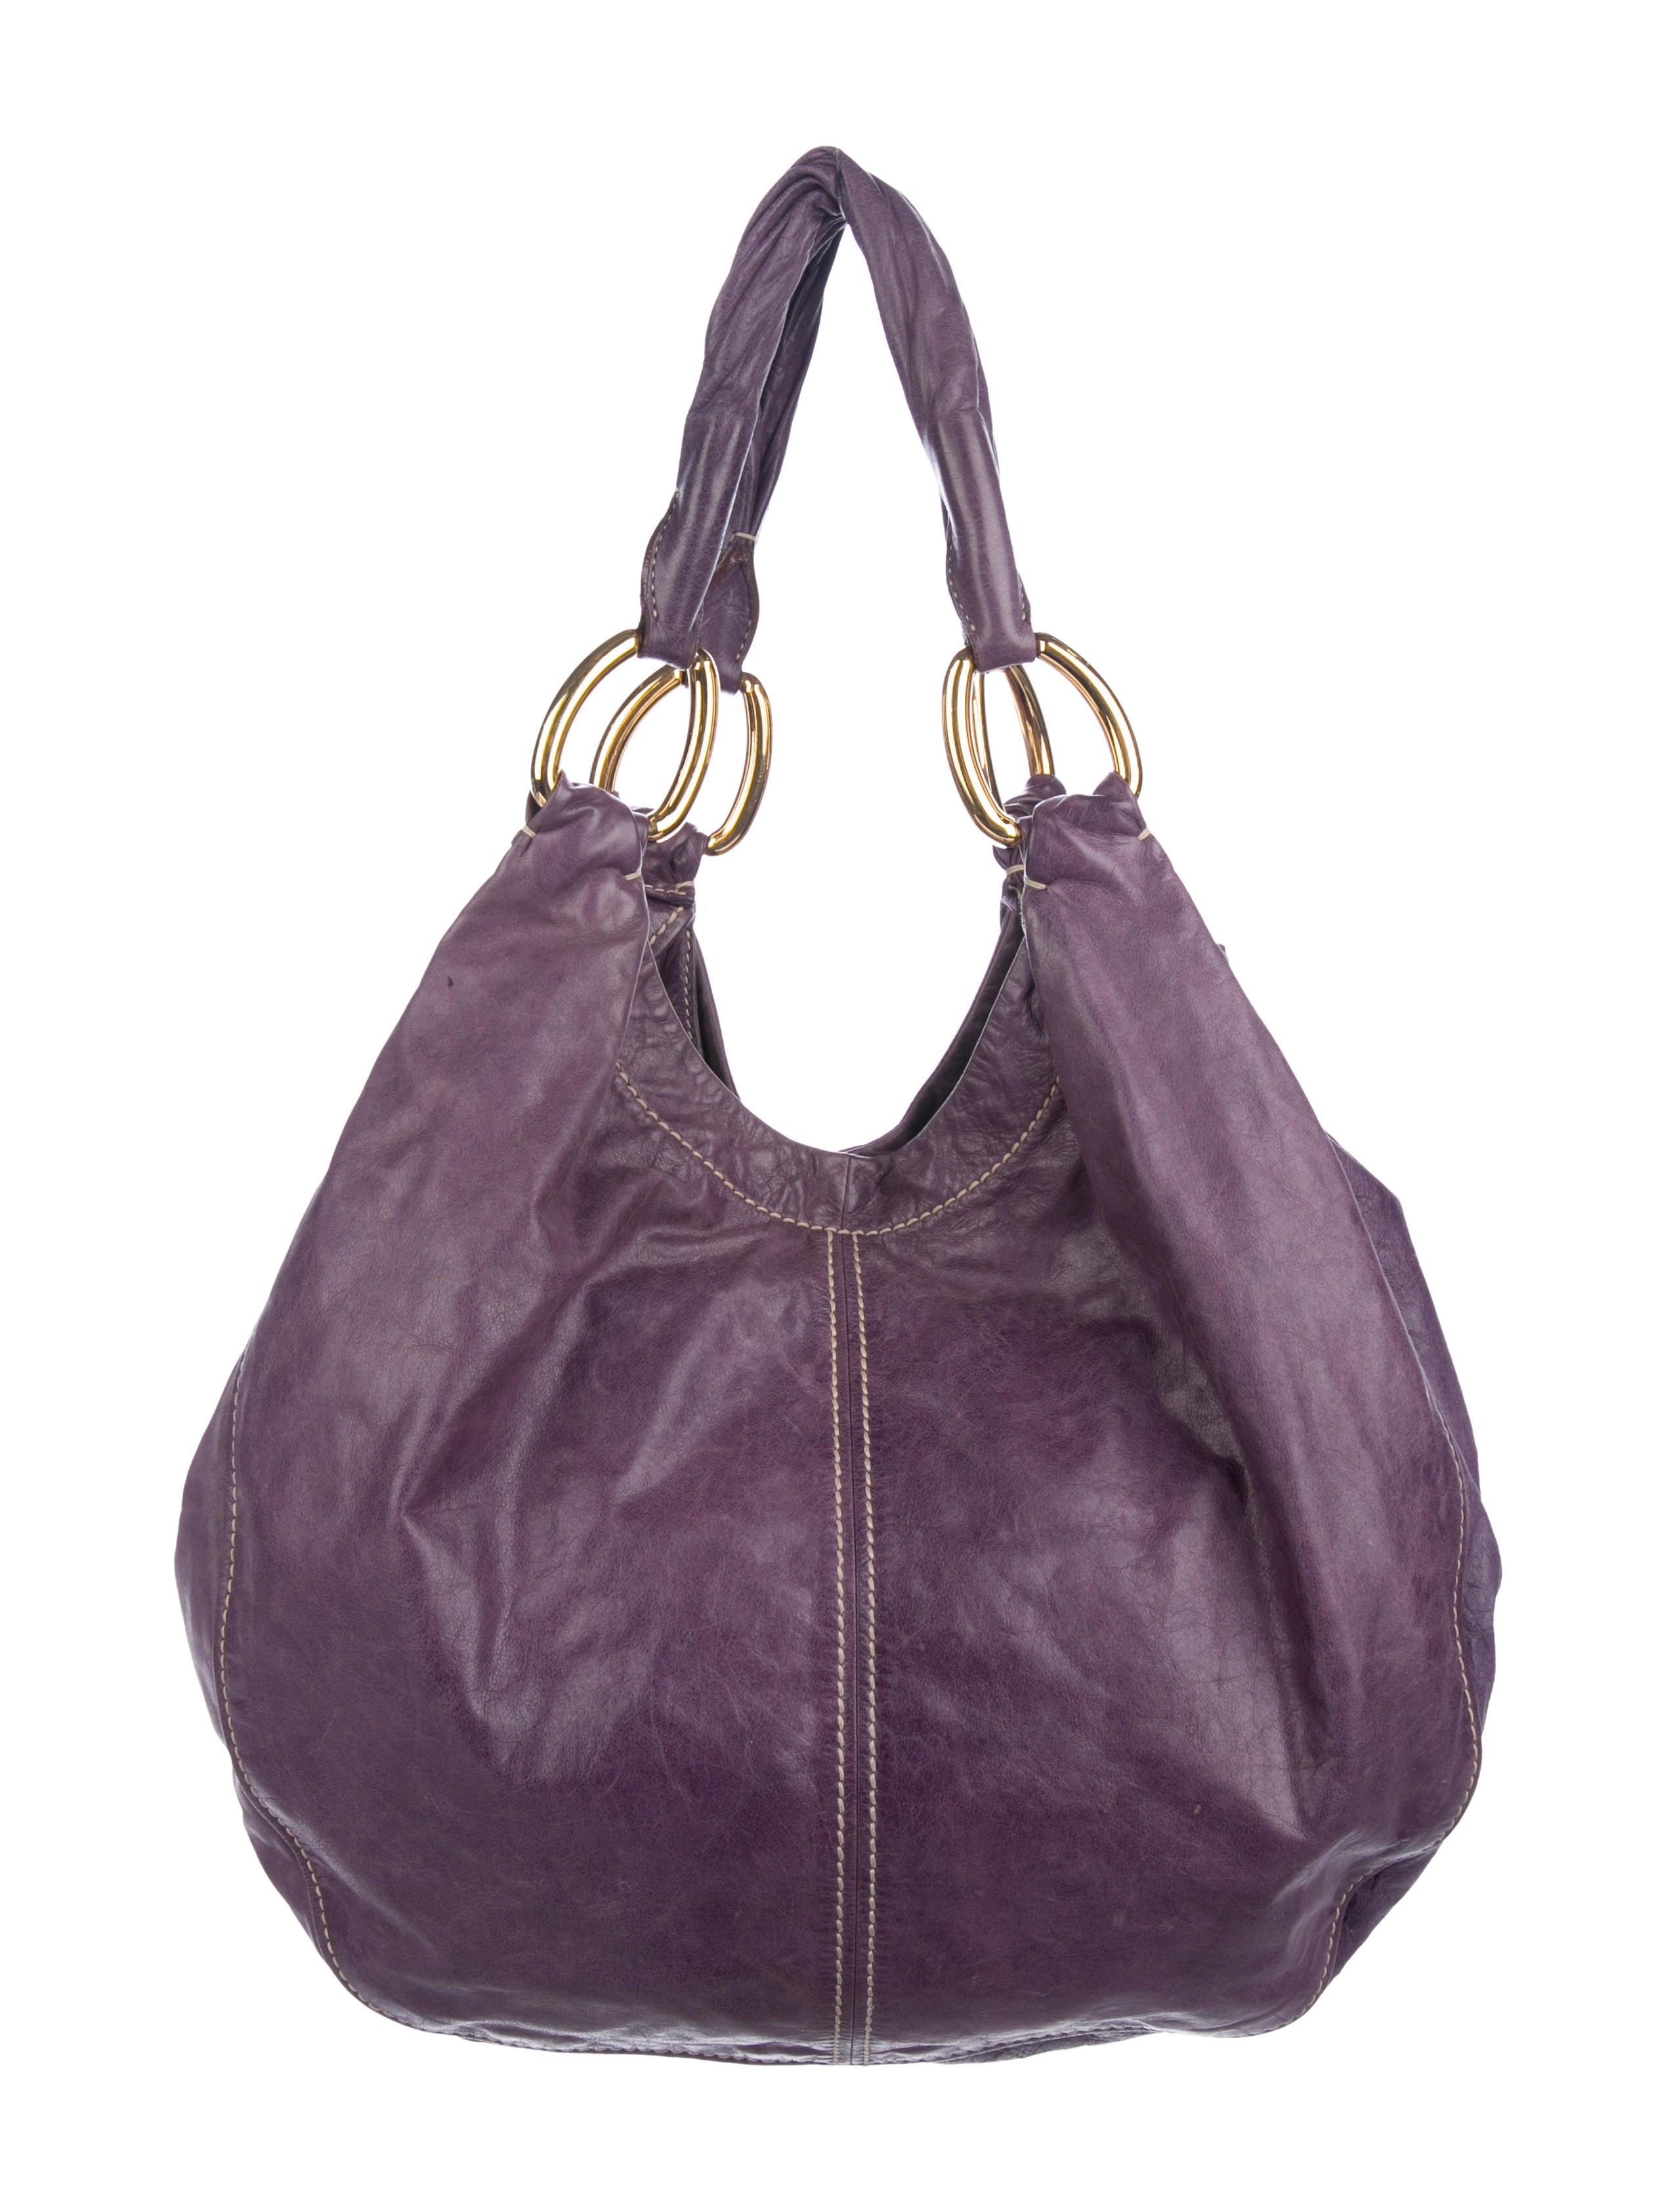 a280cd33e845 Miu Grained Leather Hobo Handbags Miu68322 The Realreal